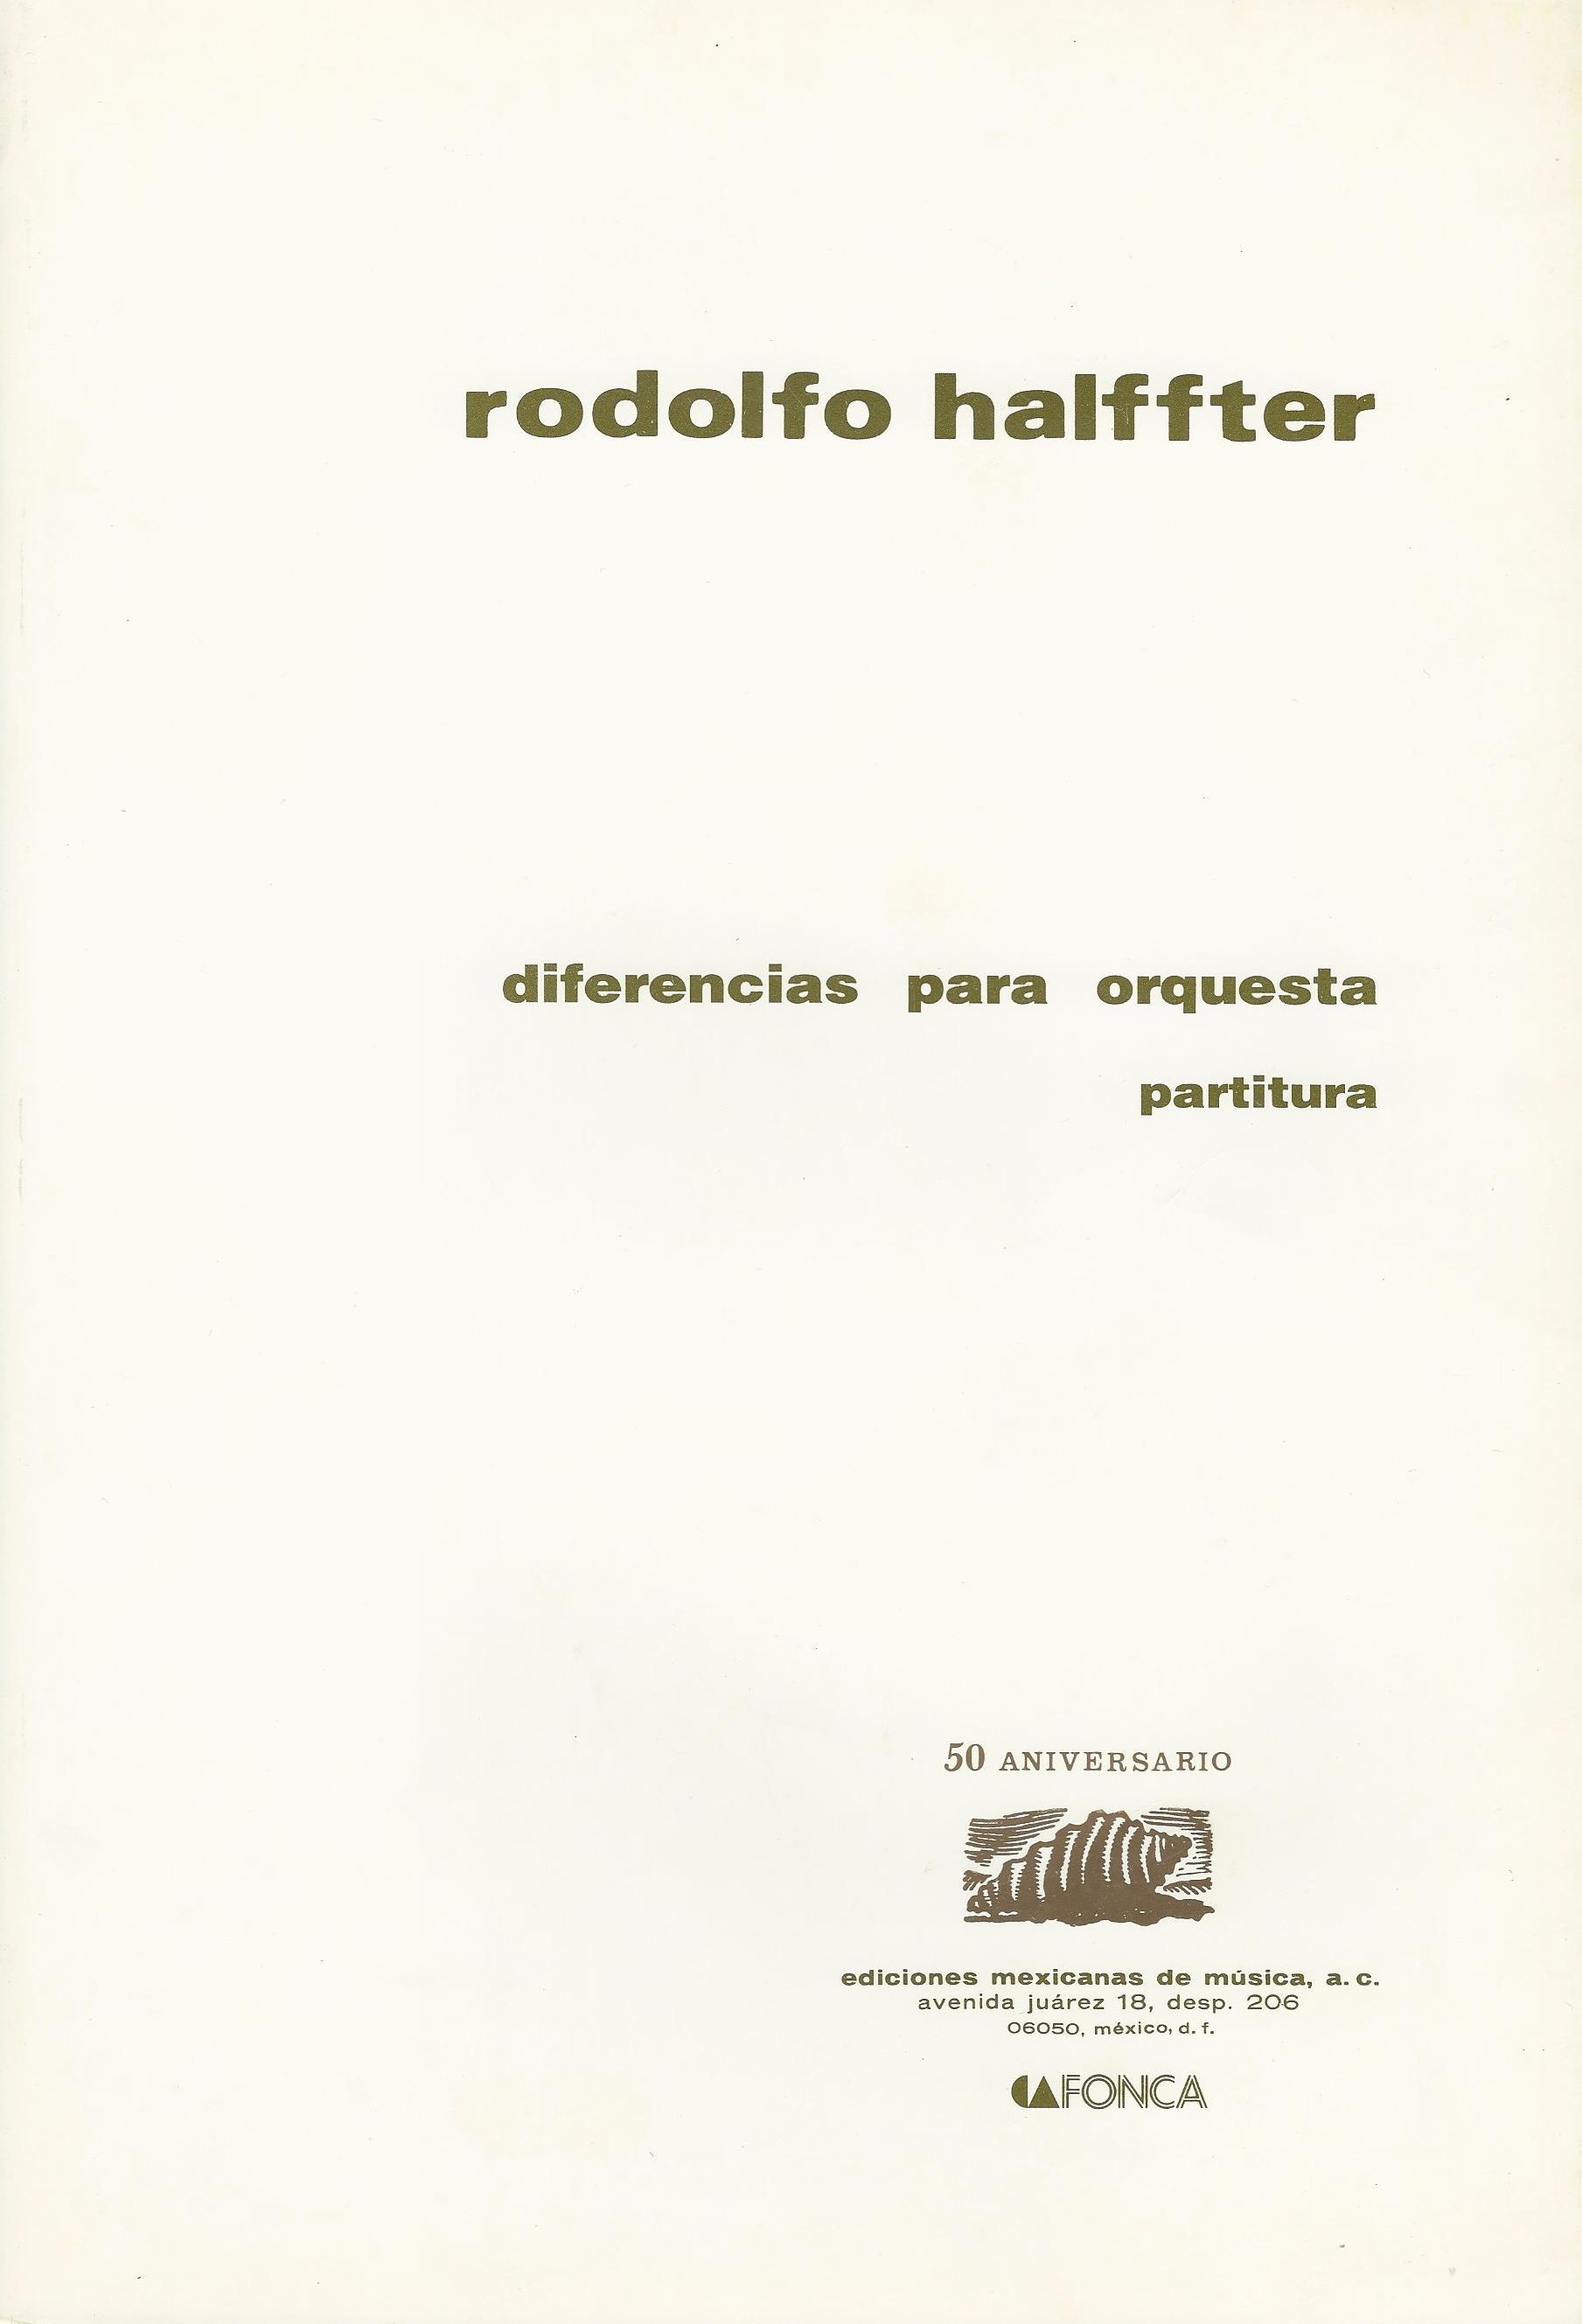 HALFFTER RODOLFO - Diferencias para orquesta 01.jpg